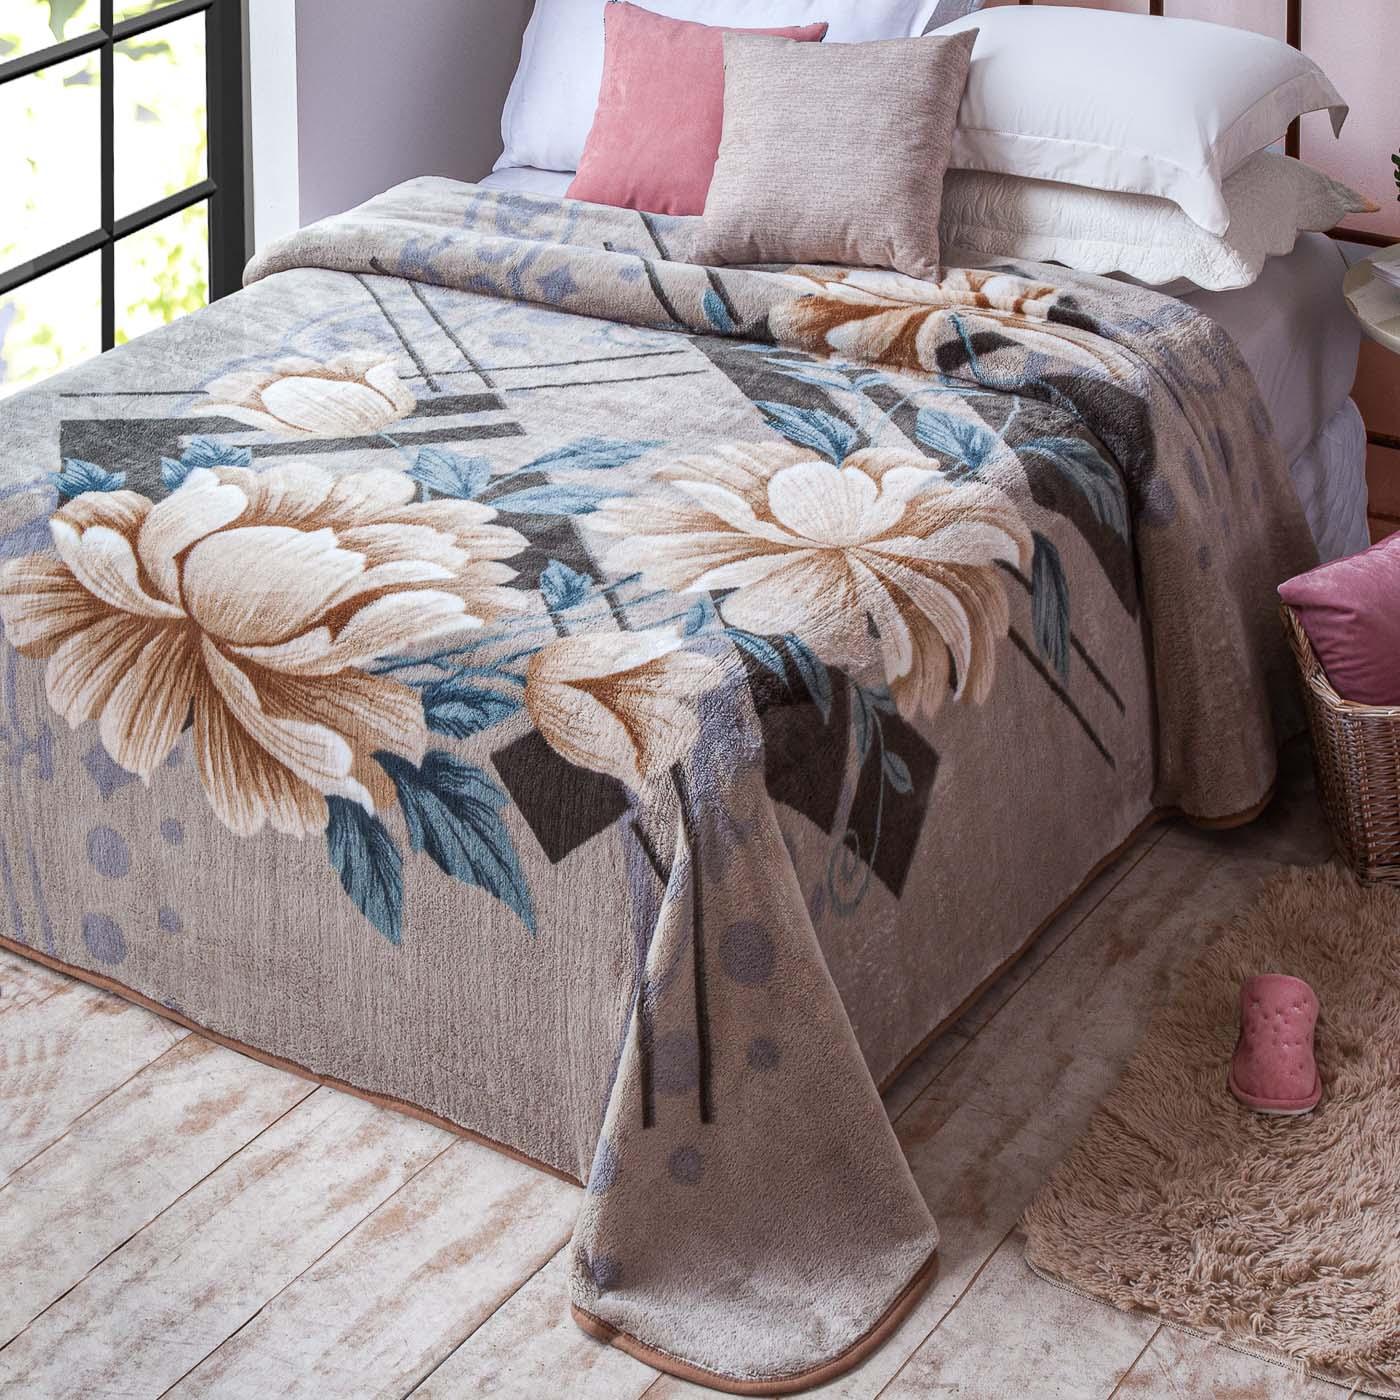 Cobertor Casal Antialergico Jolitex Kyor Plus Pristina Bege